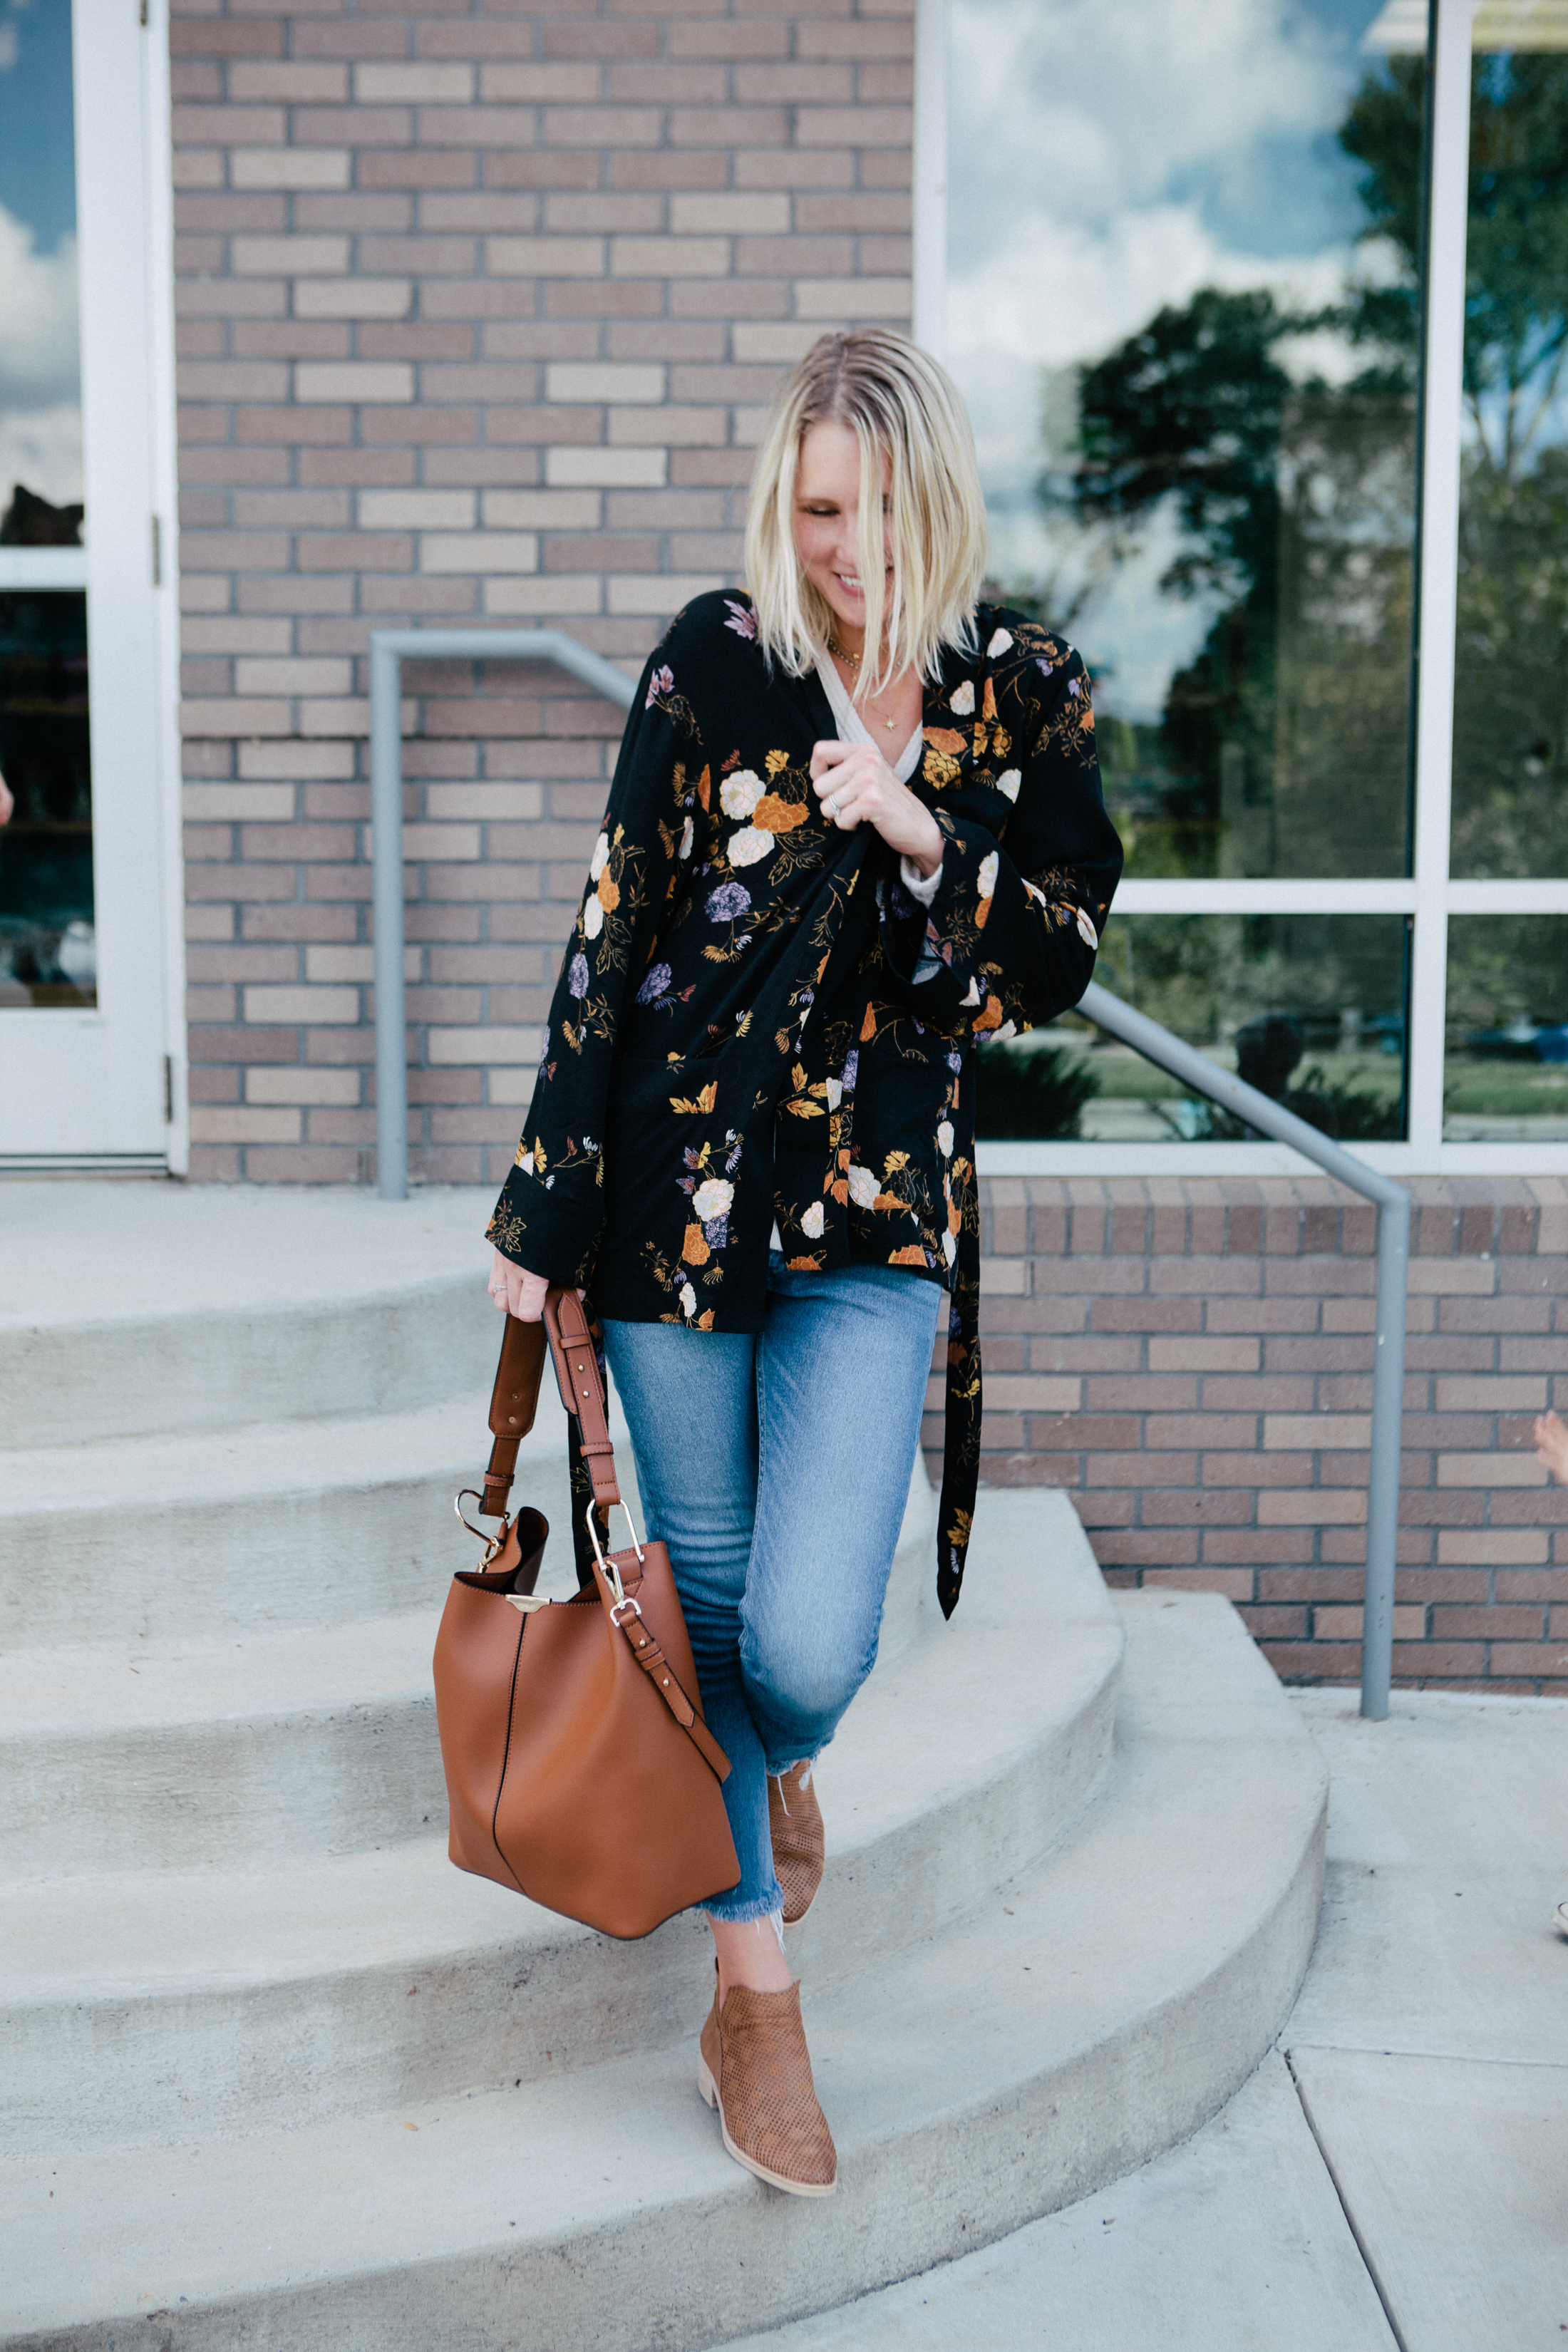 styling-kimono-for-fall